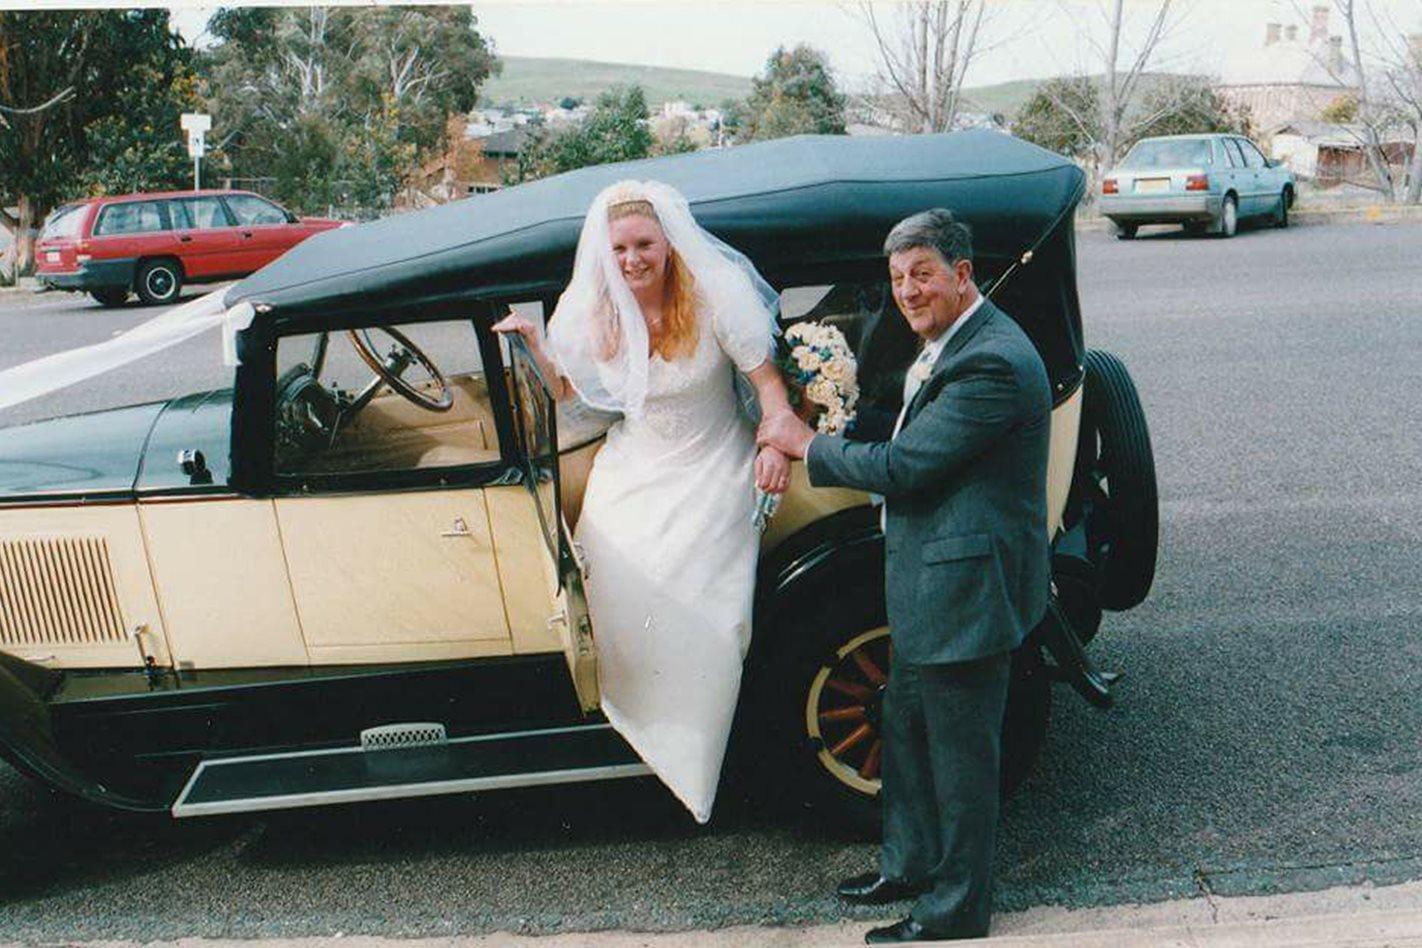 Louise Gladman's 1927 Buick wedding car